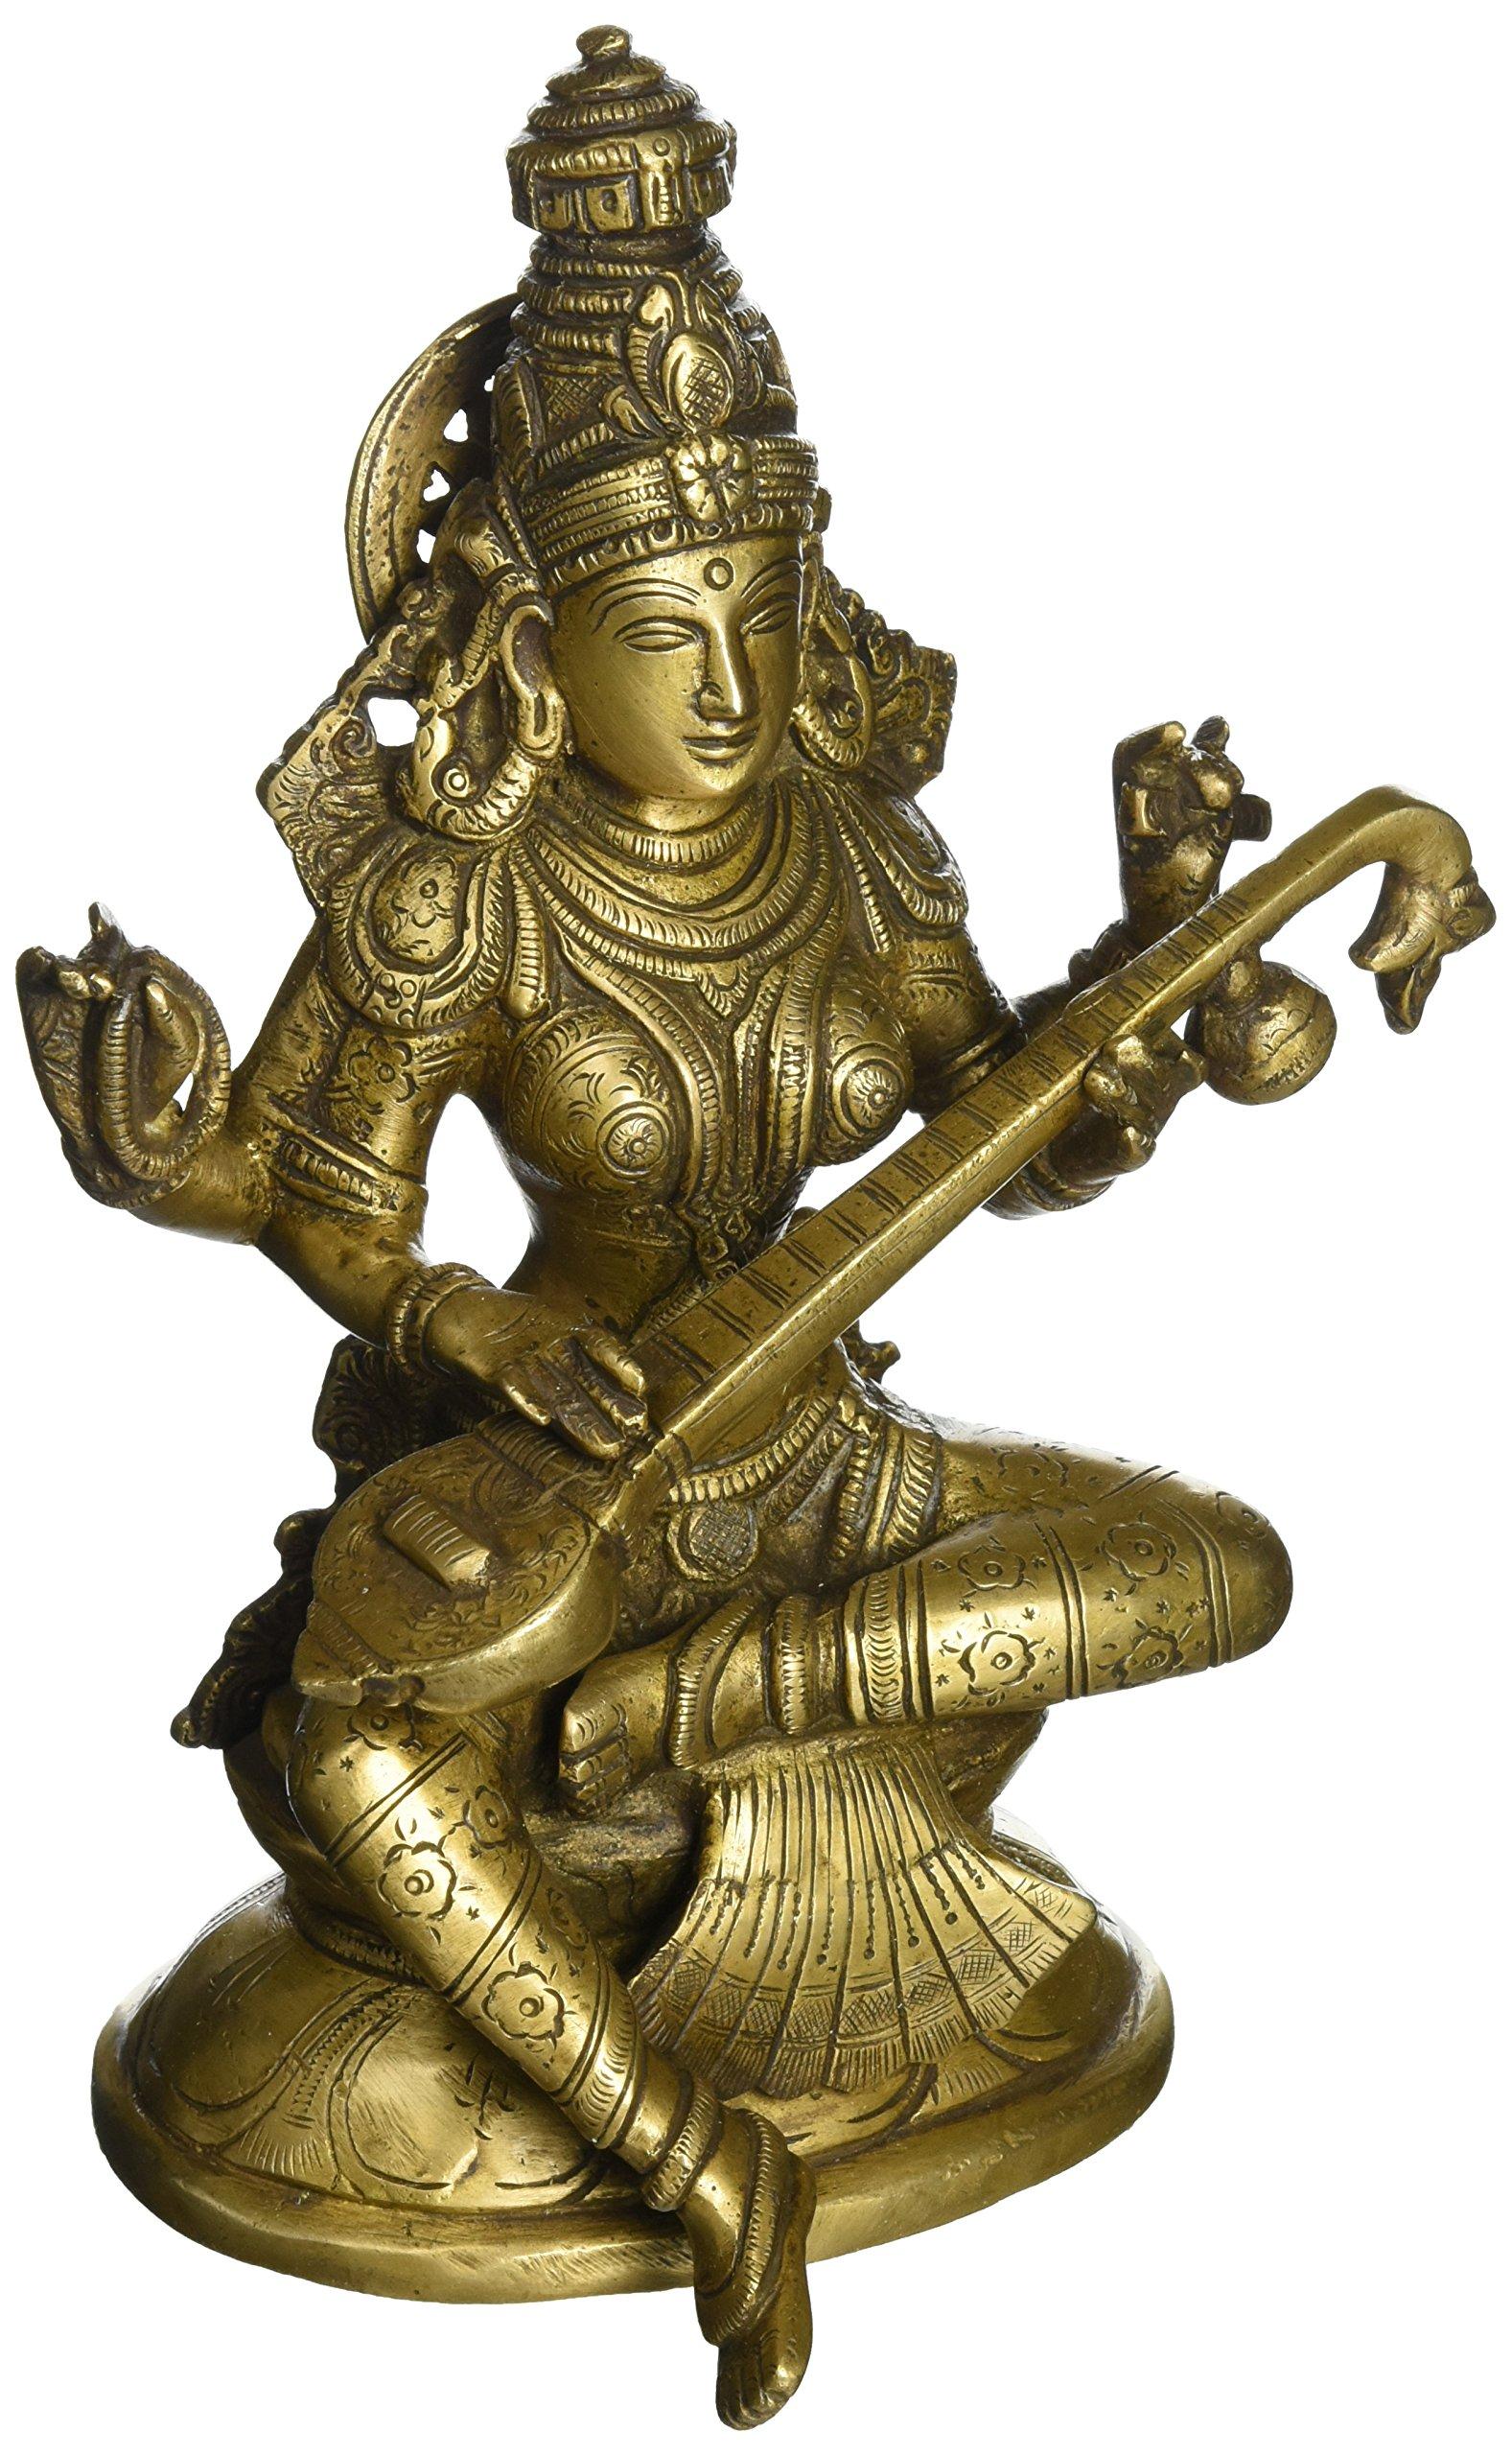 Religious Brass Figurines For Puja Goddess Saraswati Hindu Decor 8 Inch 1.62 Kg